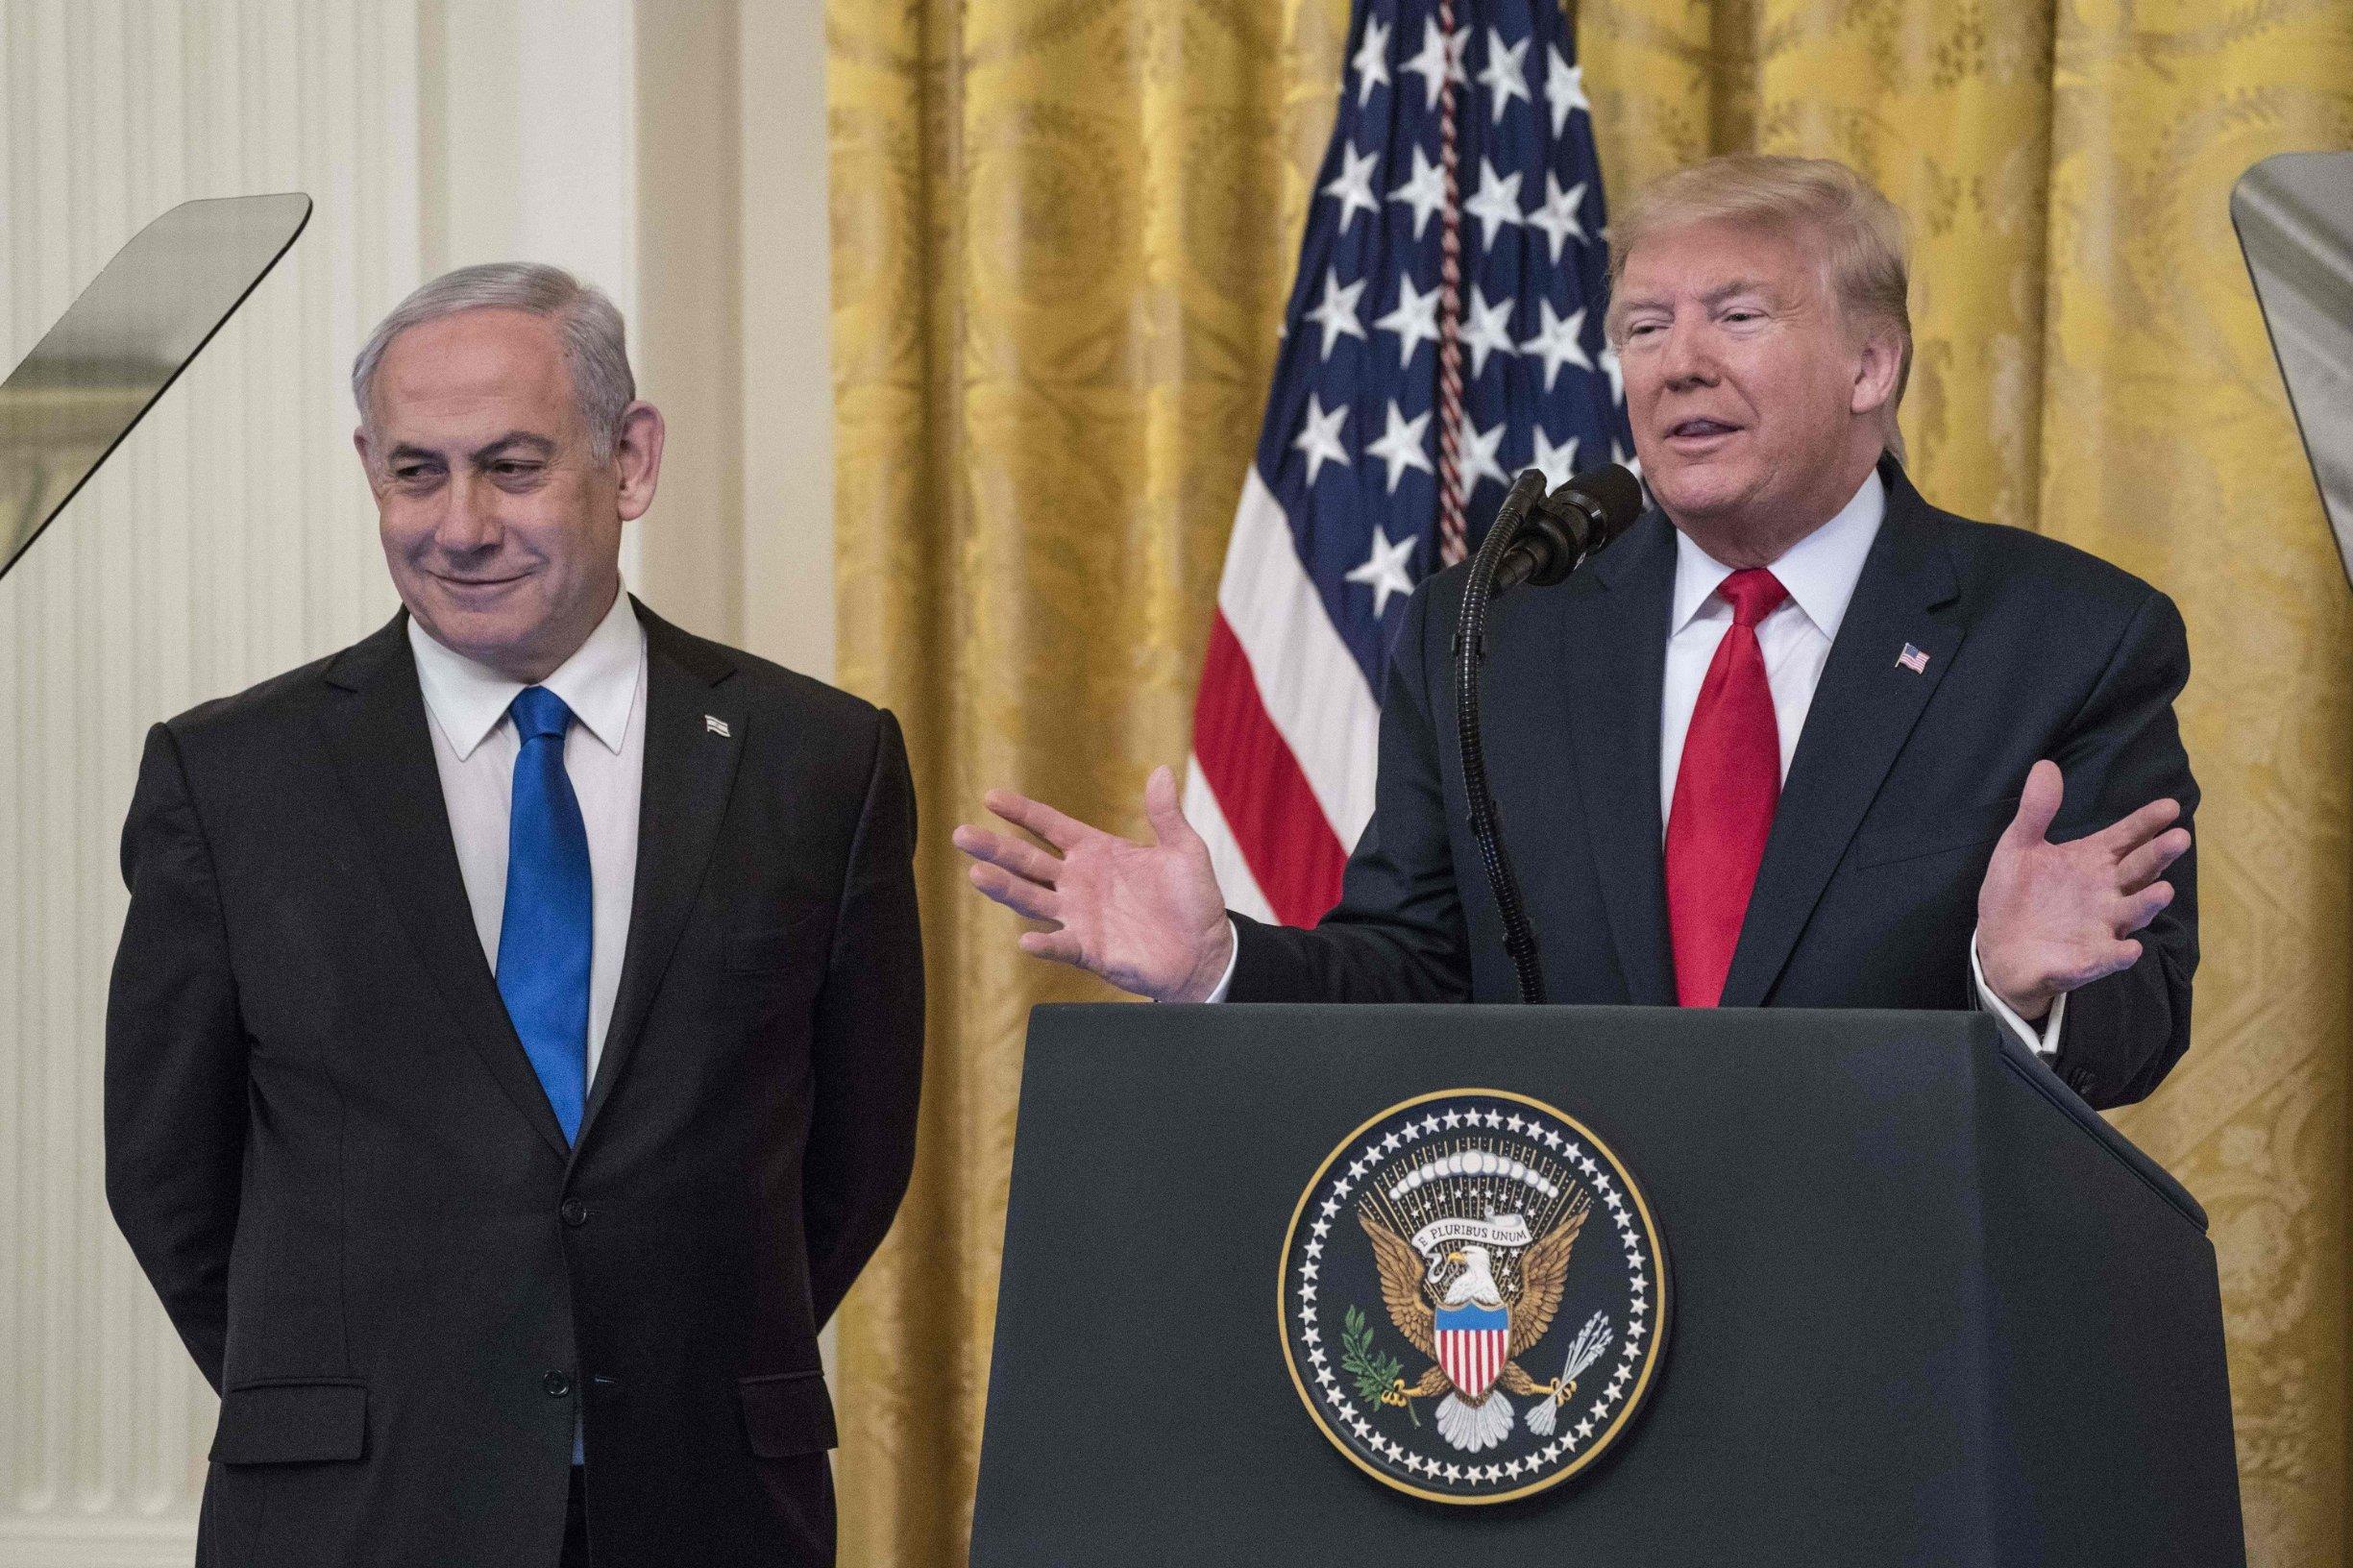 Izraelski premijer Benjamin Netanyahu i američki predsjednik Donald Trump predstavljaju mirovni plan za izraelsko palestinski spor